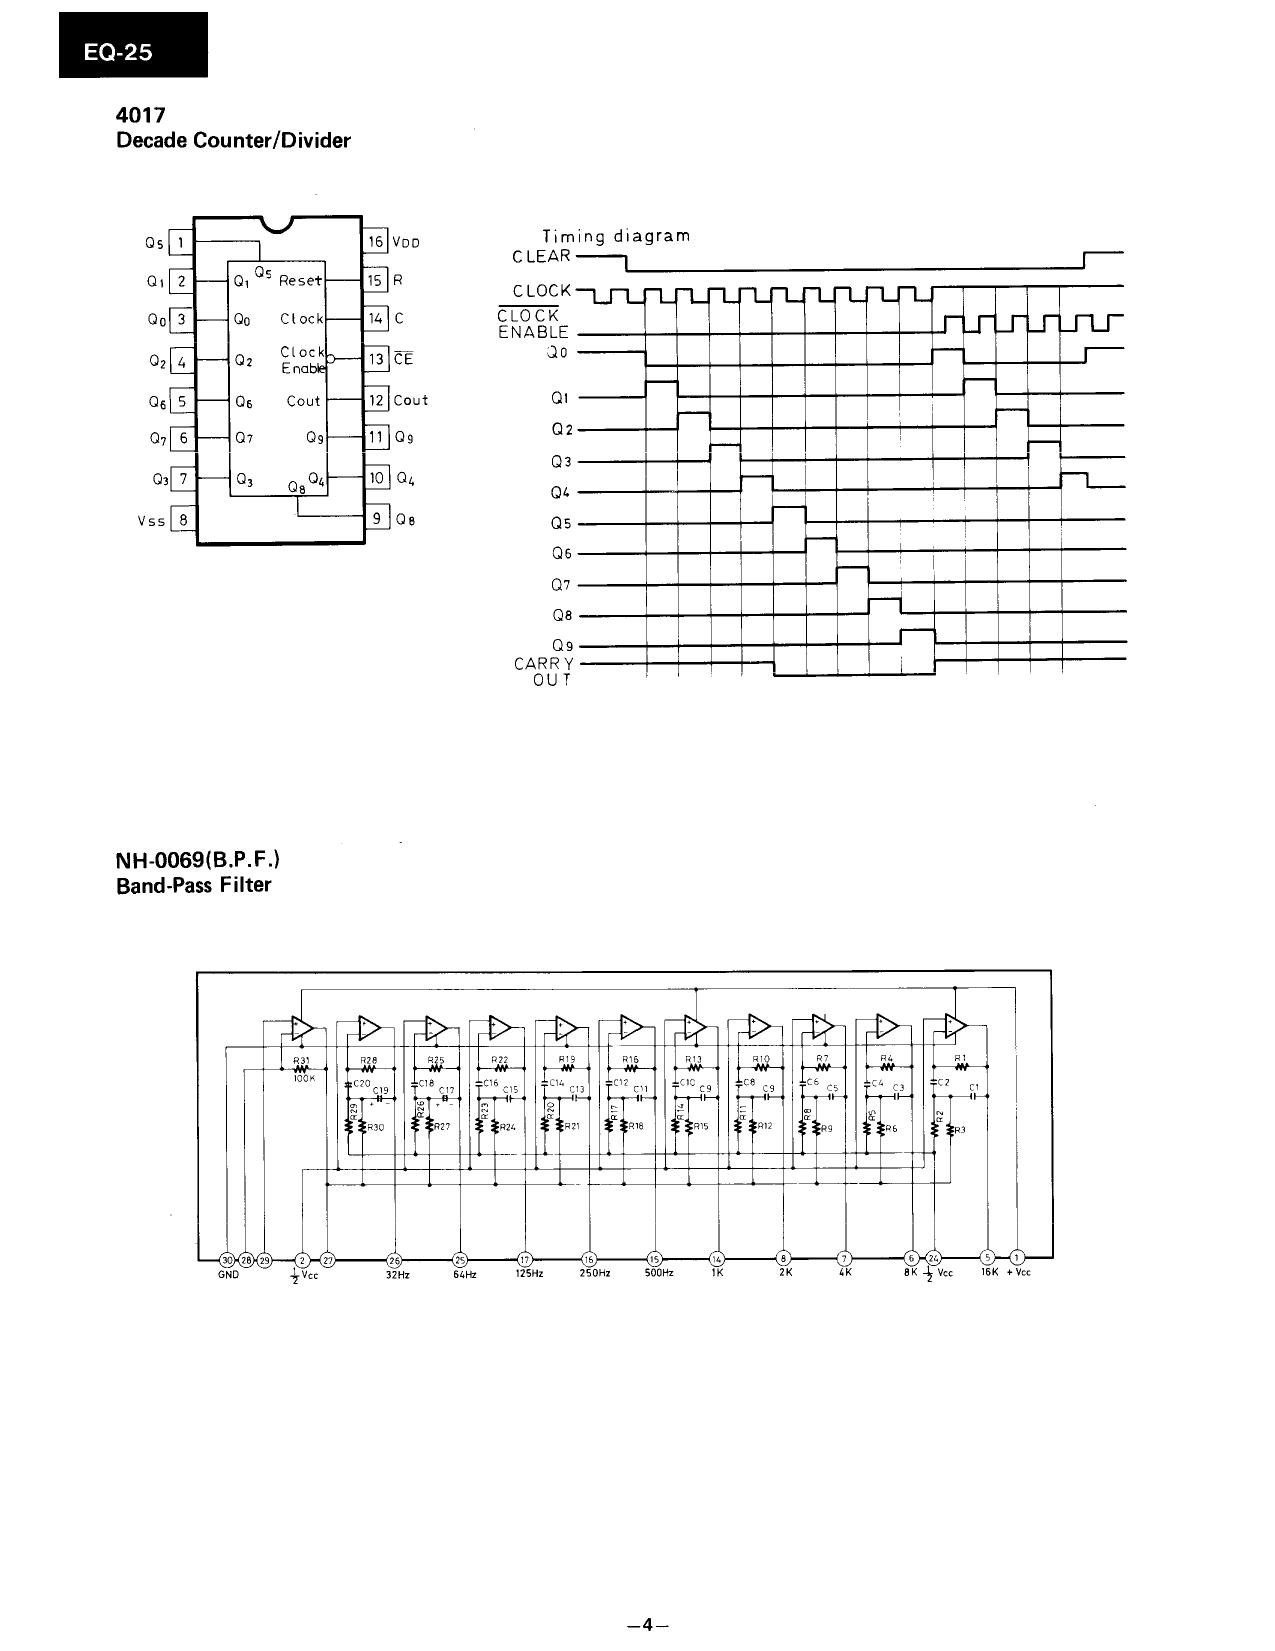 Onkyo Eq25 Wiring Diagram Electrical Diagrams Enthusiast U2022 Electric Motor